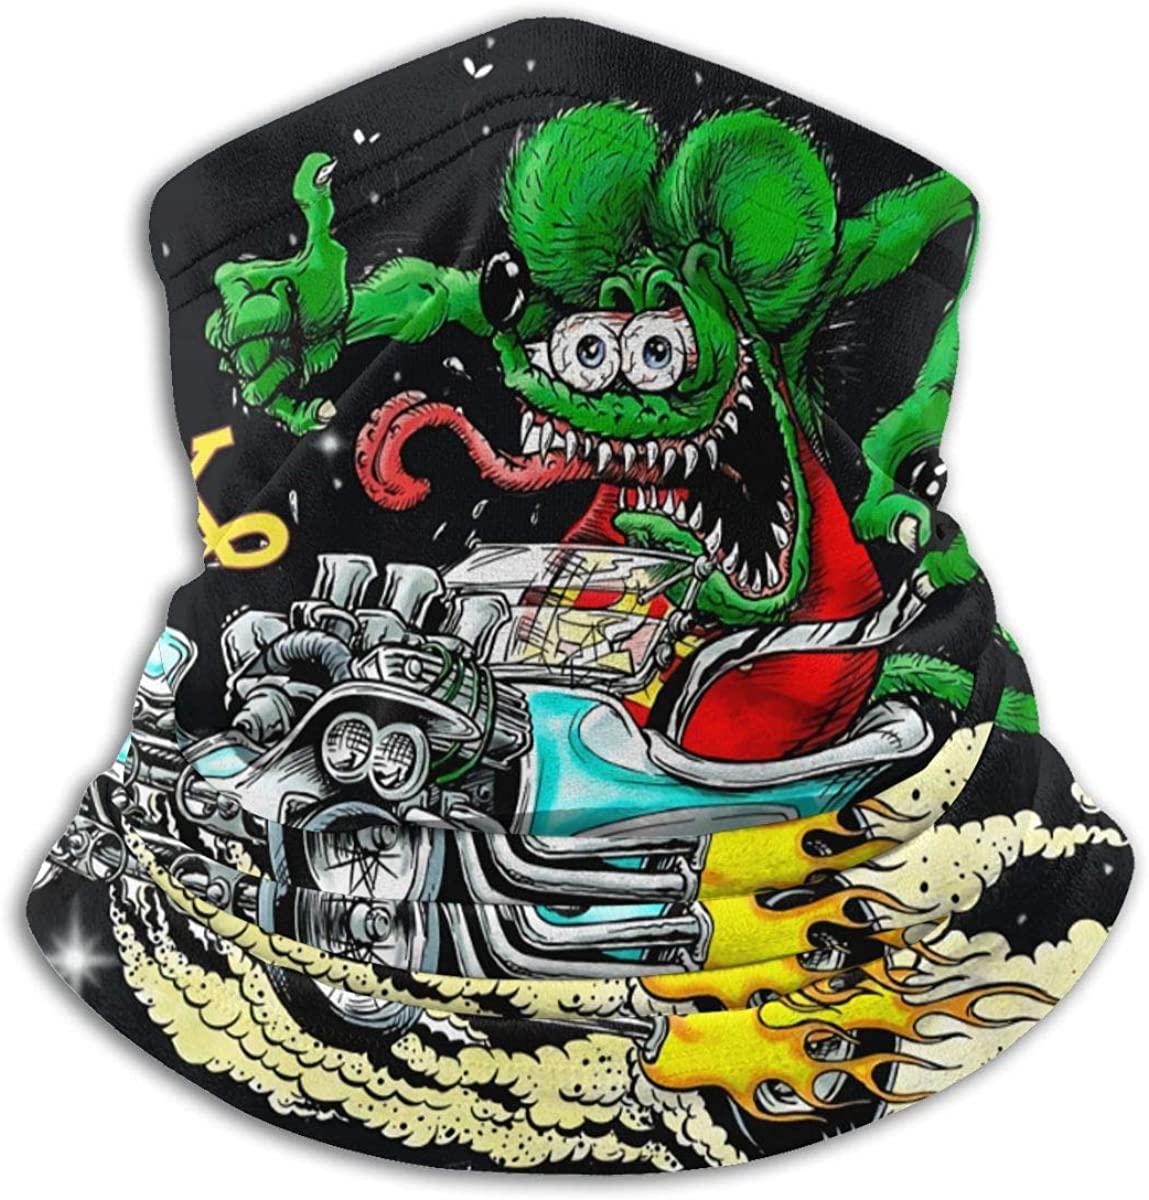 JUDE NICHOLLS Rat Fink Face Cover Shield Neck Warmer Neck Scarf Multifunctional Headband Headwear Headwrap Balaclava Elastic Mouth Shields Unisex Windproof Breathable Reusable Anti Dust